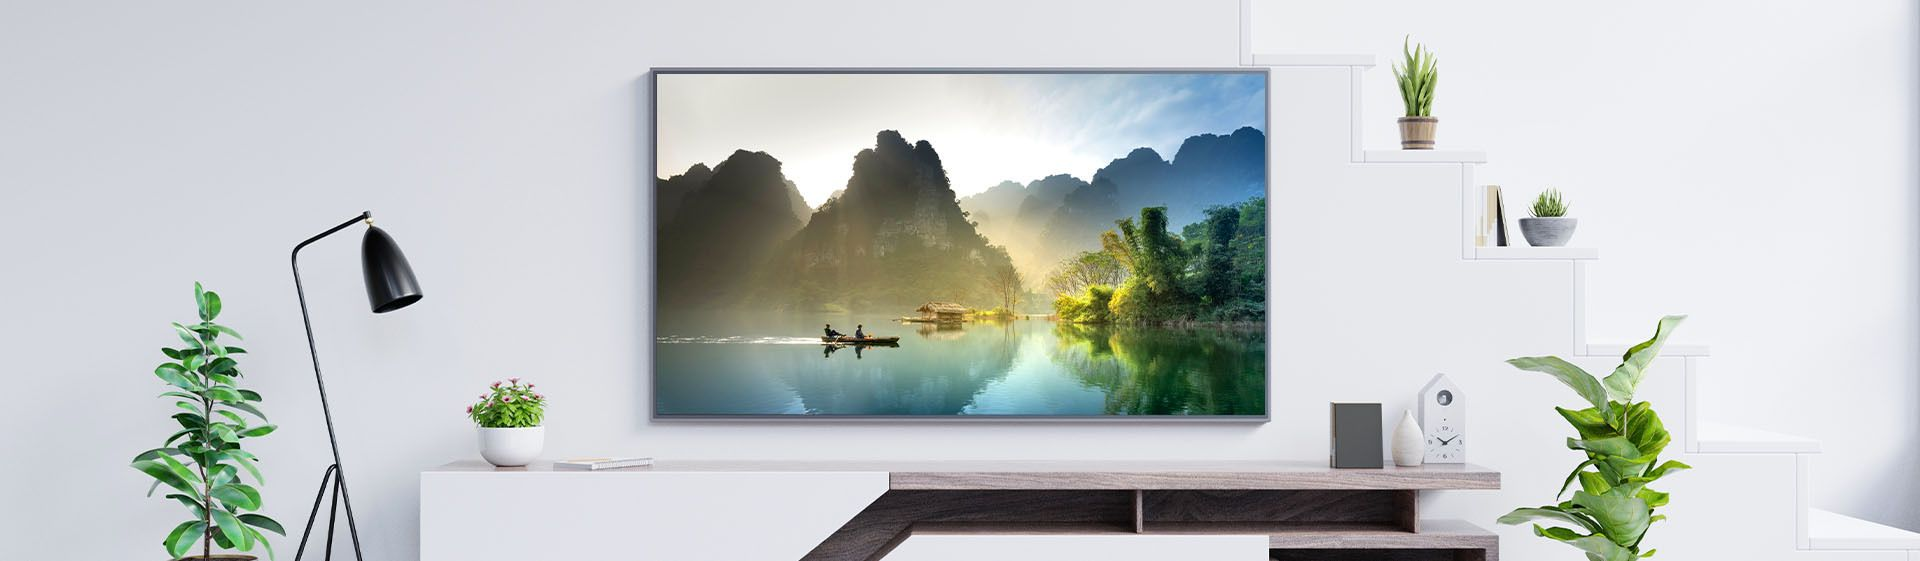 TV Full HD ainda vale a pena?